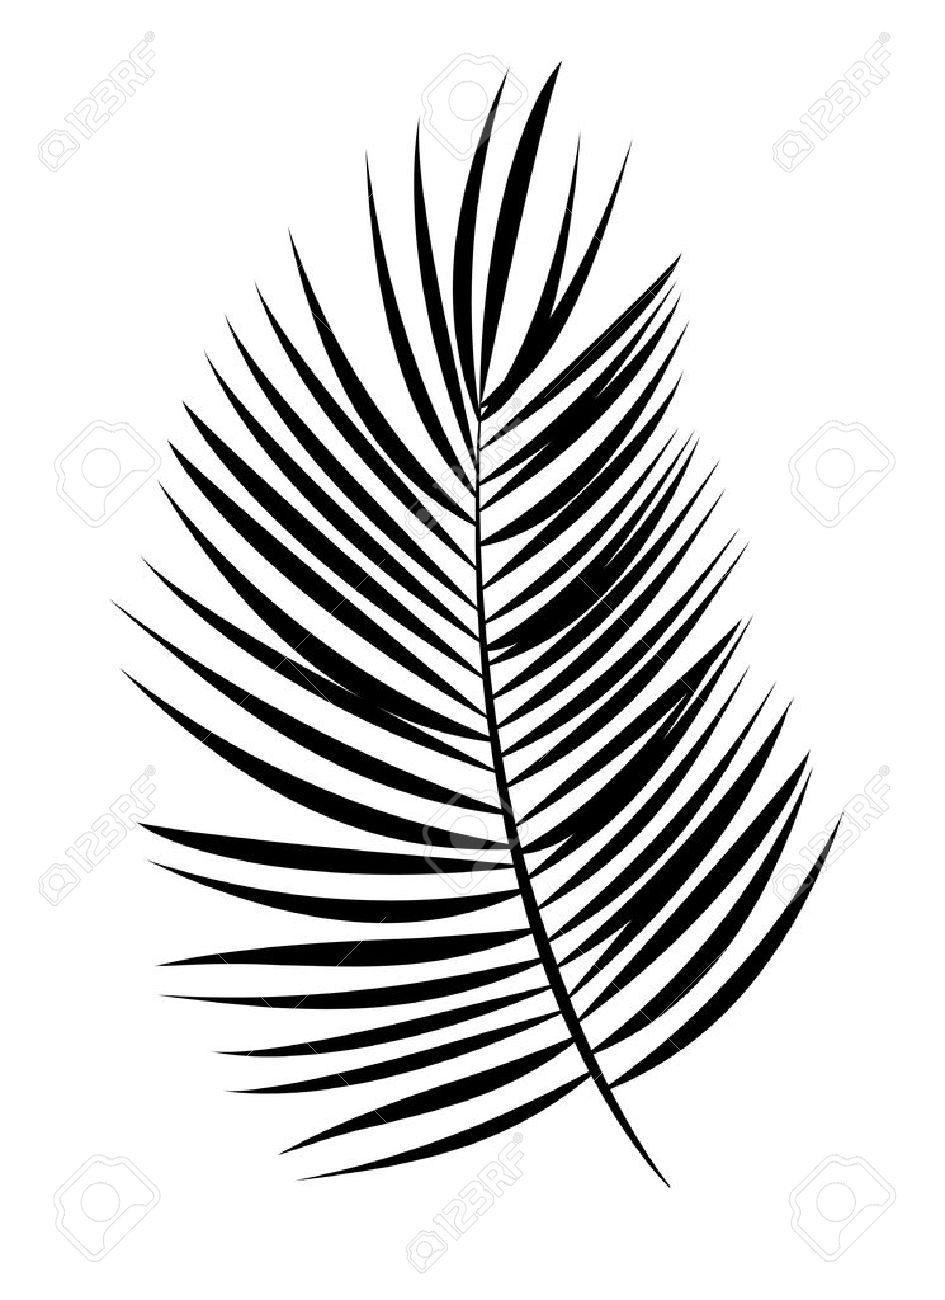 palm leaf vector background isolated illustration eps10 royalty free rh 123rf com palm leaf vector download palm leaf vector download